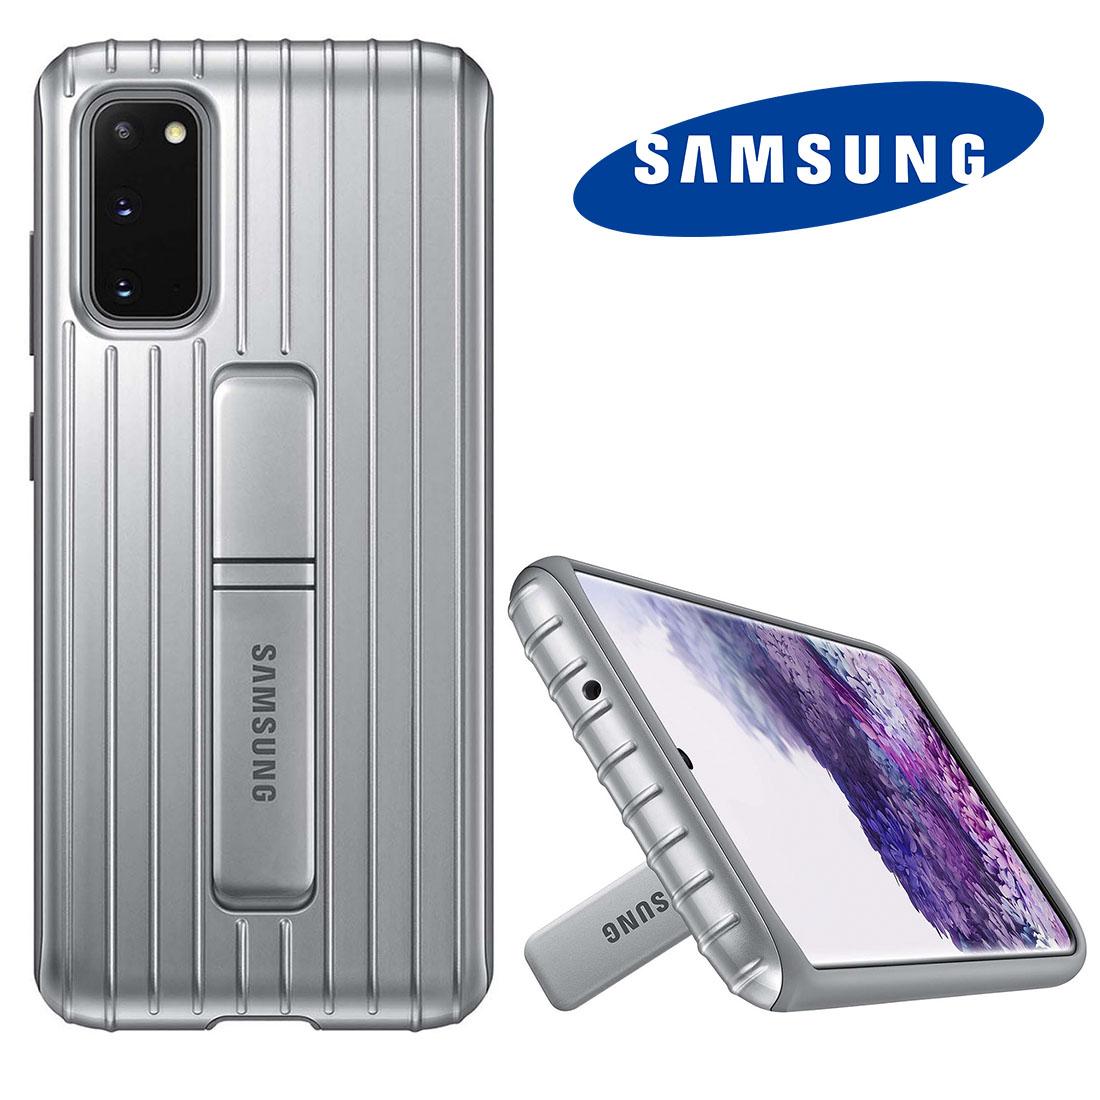 Capa Militar Original Samsung Protective Standing Galaxy S20 6.2 pol SM-G980